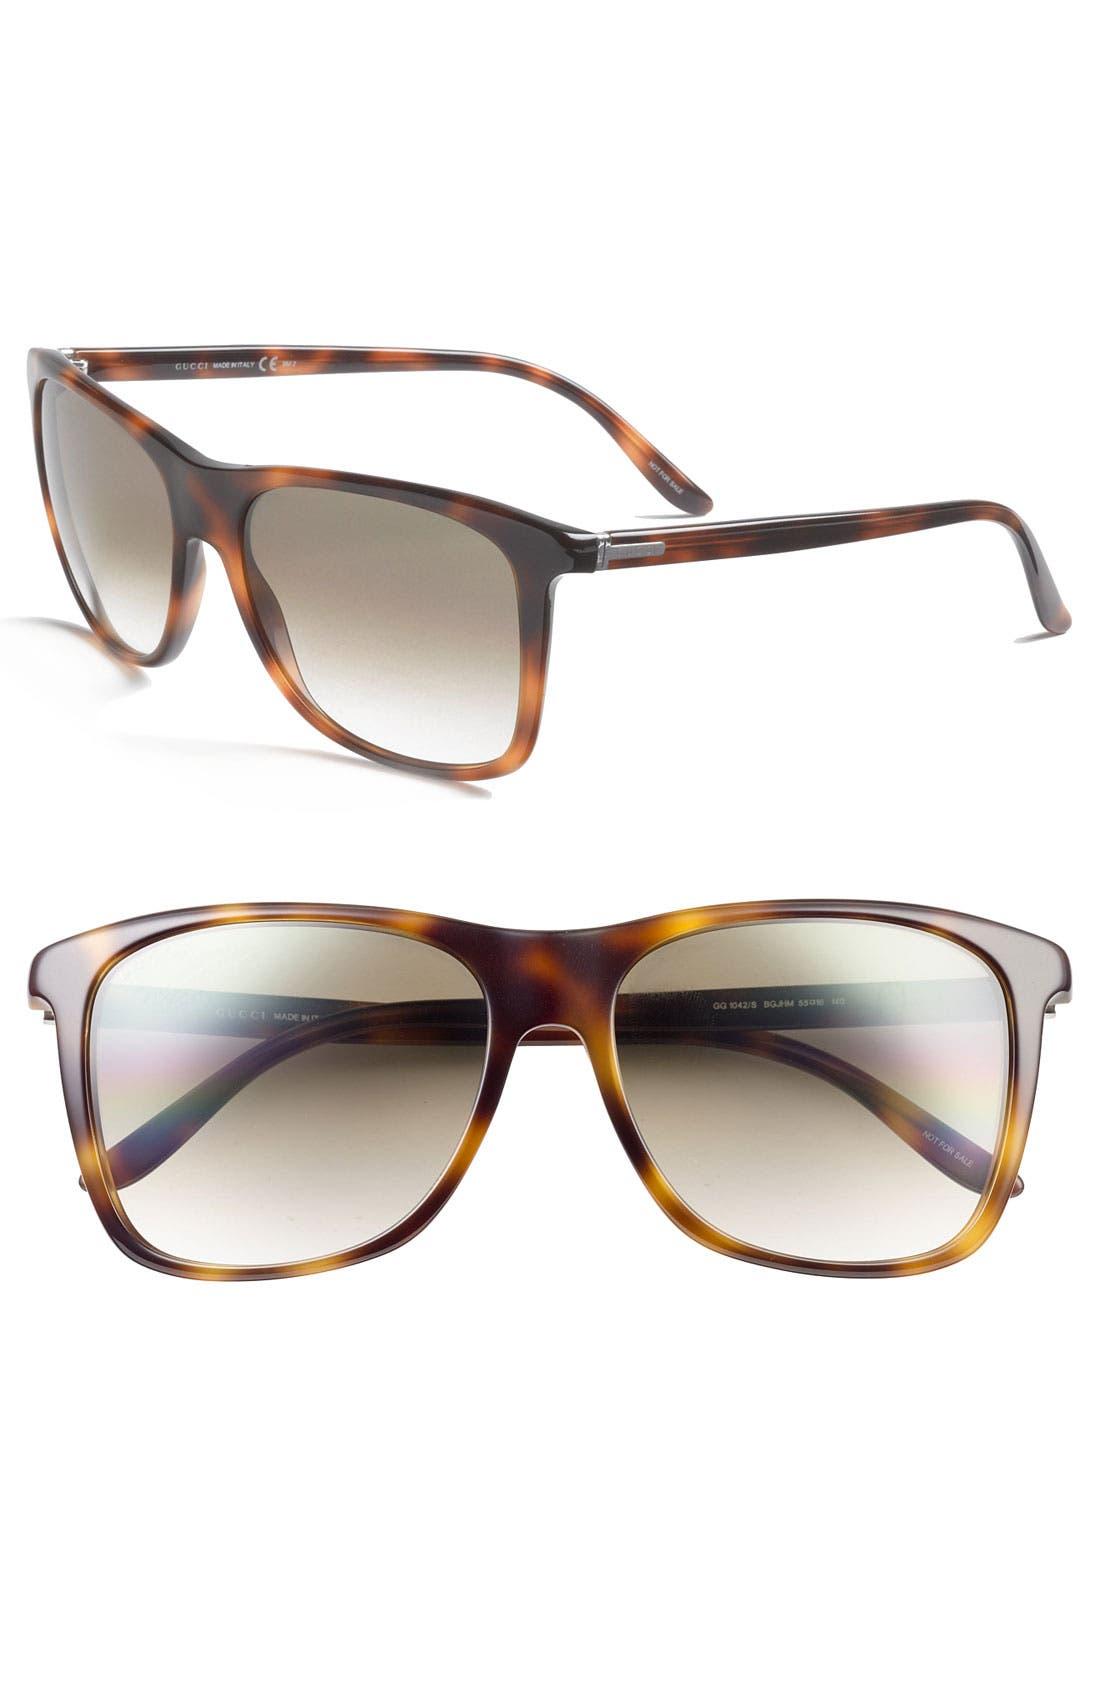 Main Image - Gucci Rectangular 55mm Sunglasses